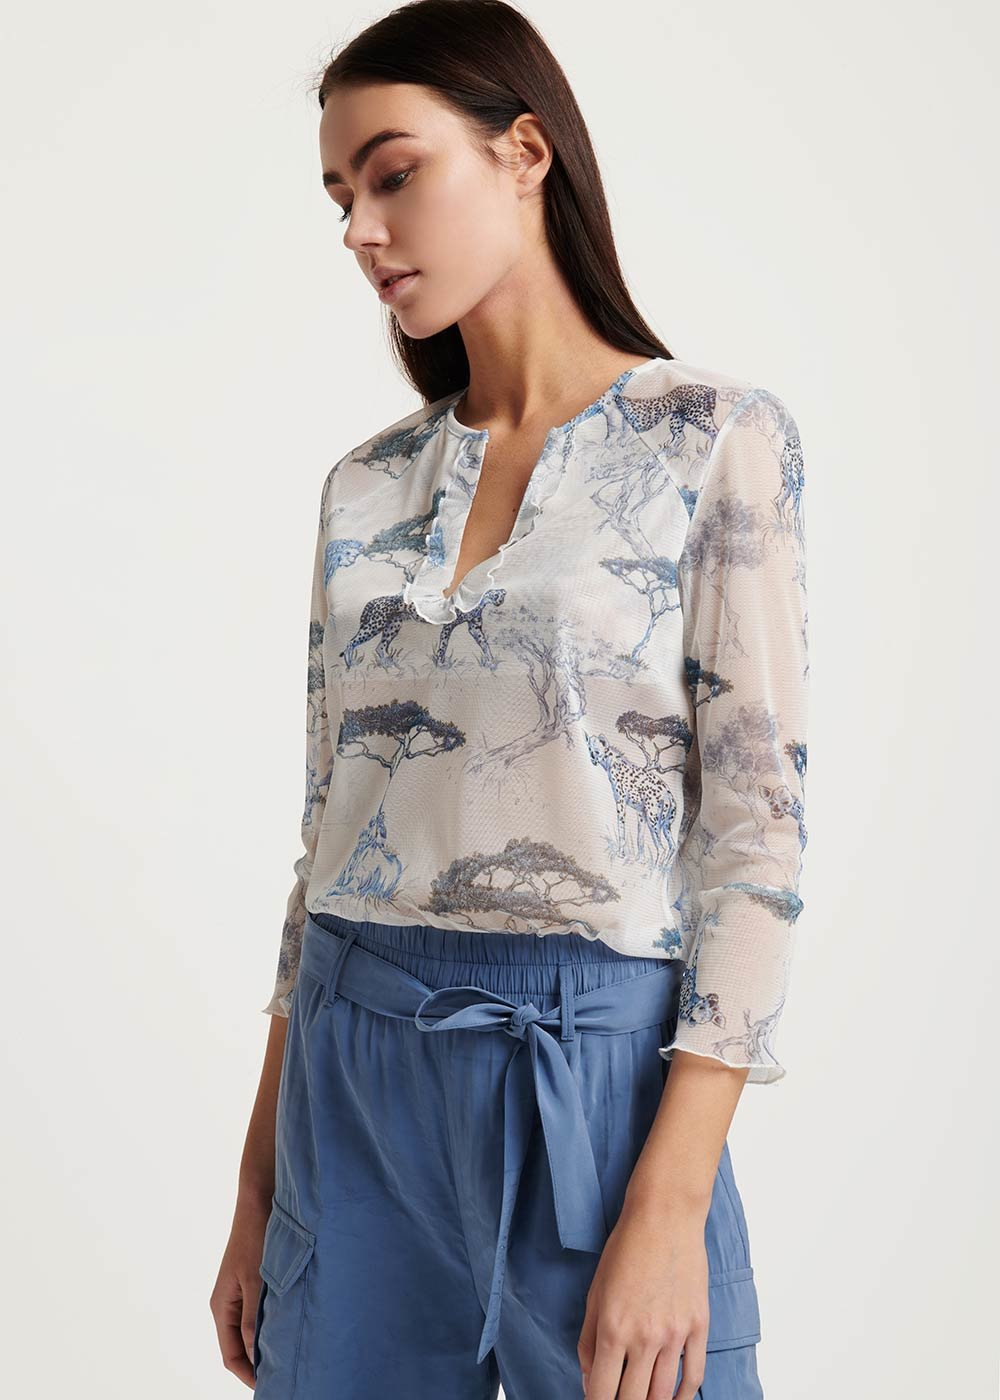 T-shirt Sirya stampa savana - White \ Avion Fantasia - Donna